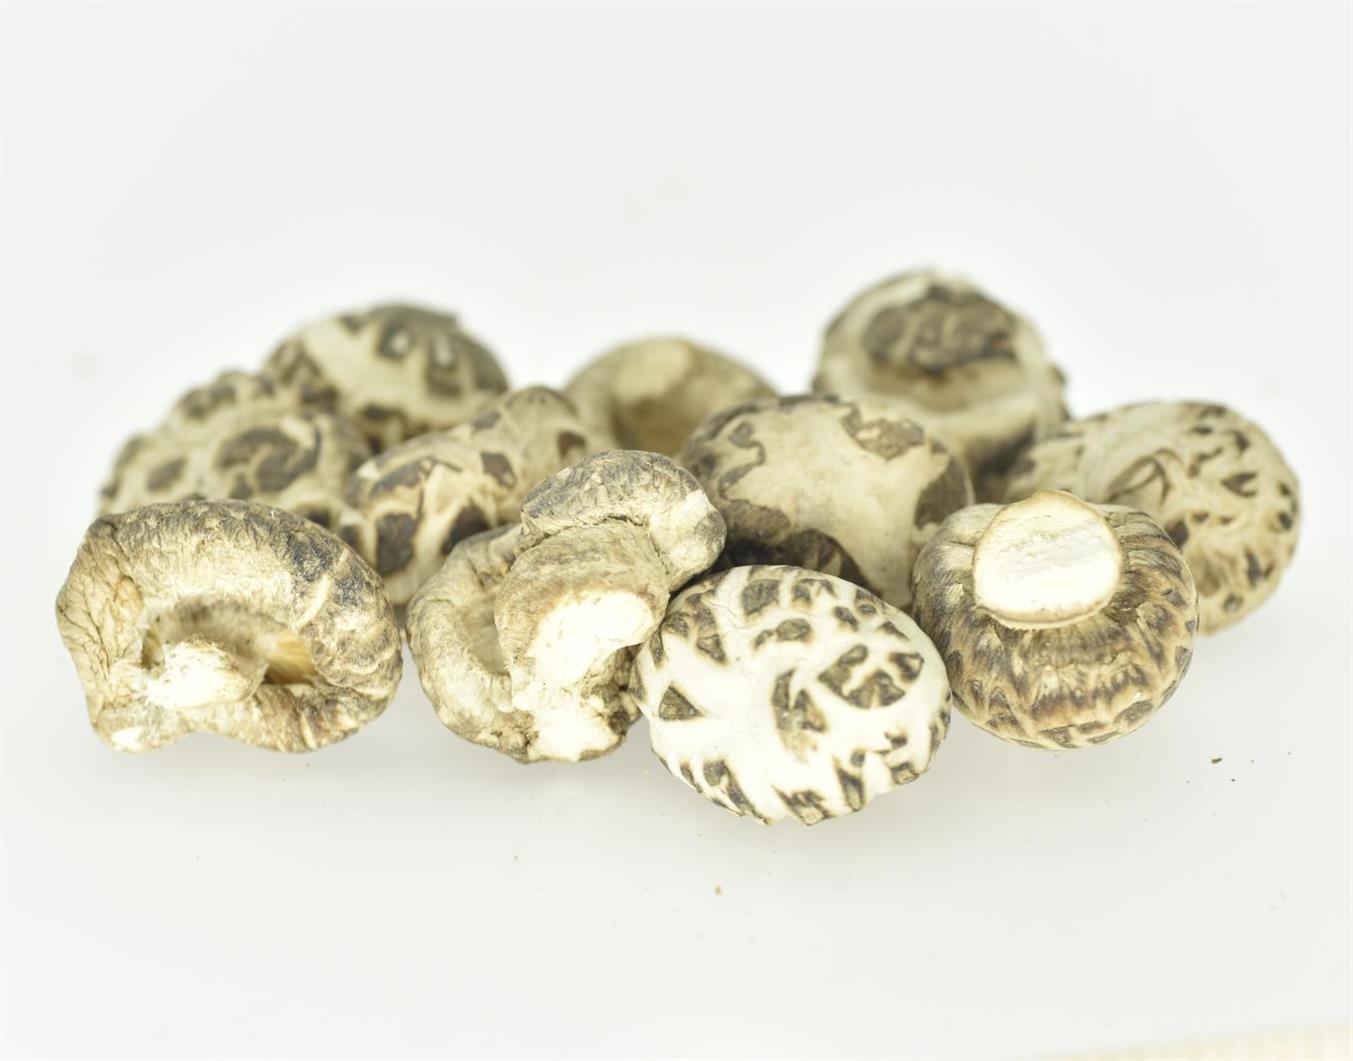 Nature Dried Mushroom, White Flower Mushroom, Shiitake Mushroom